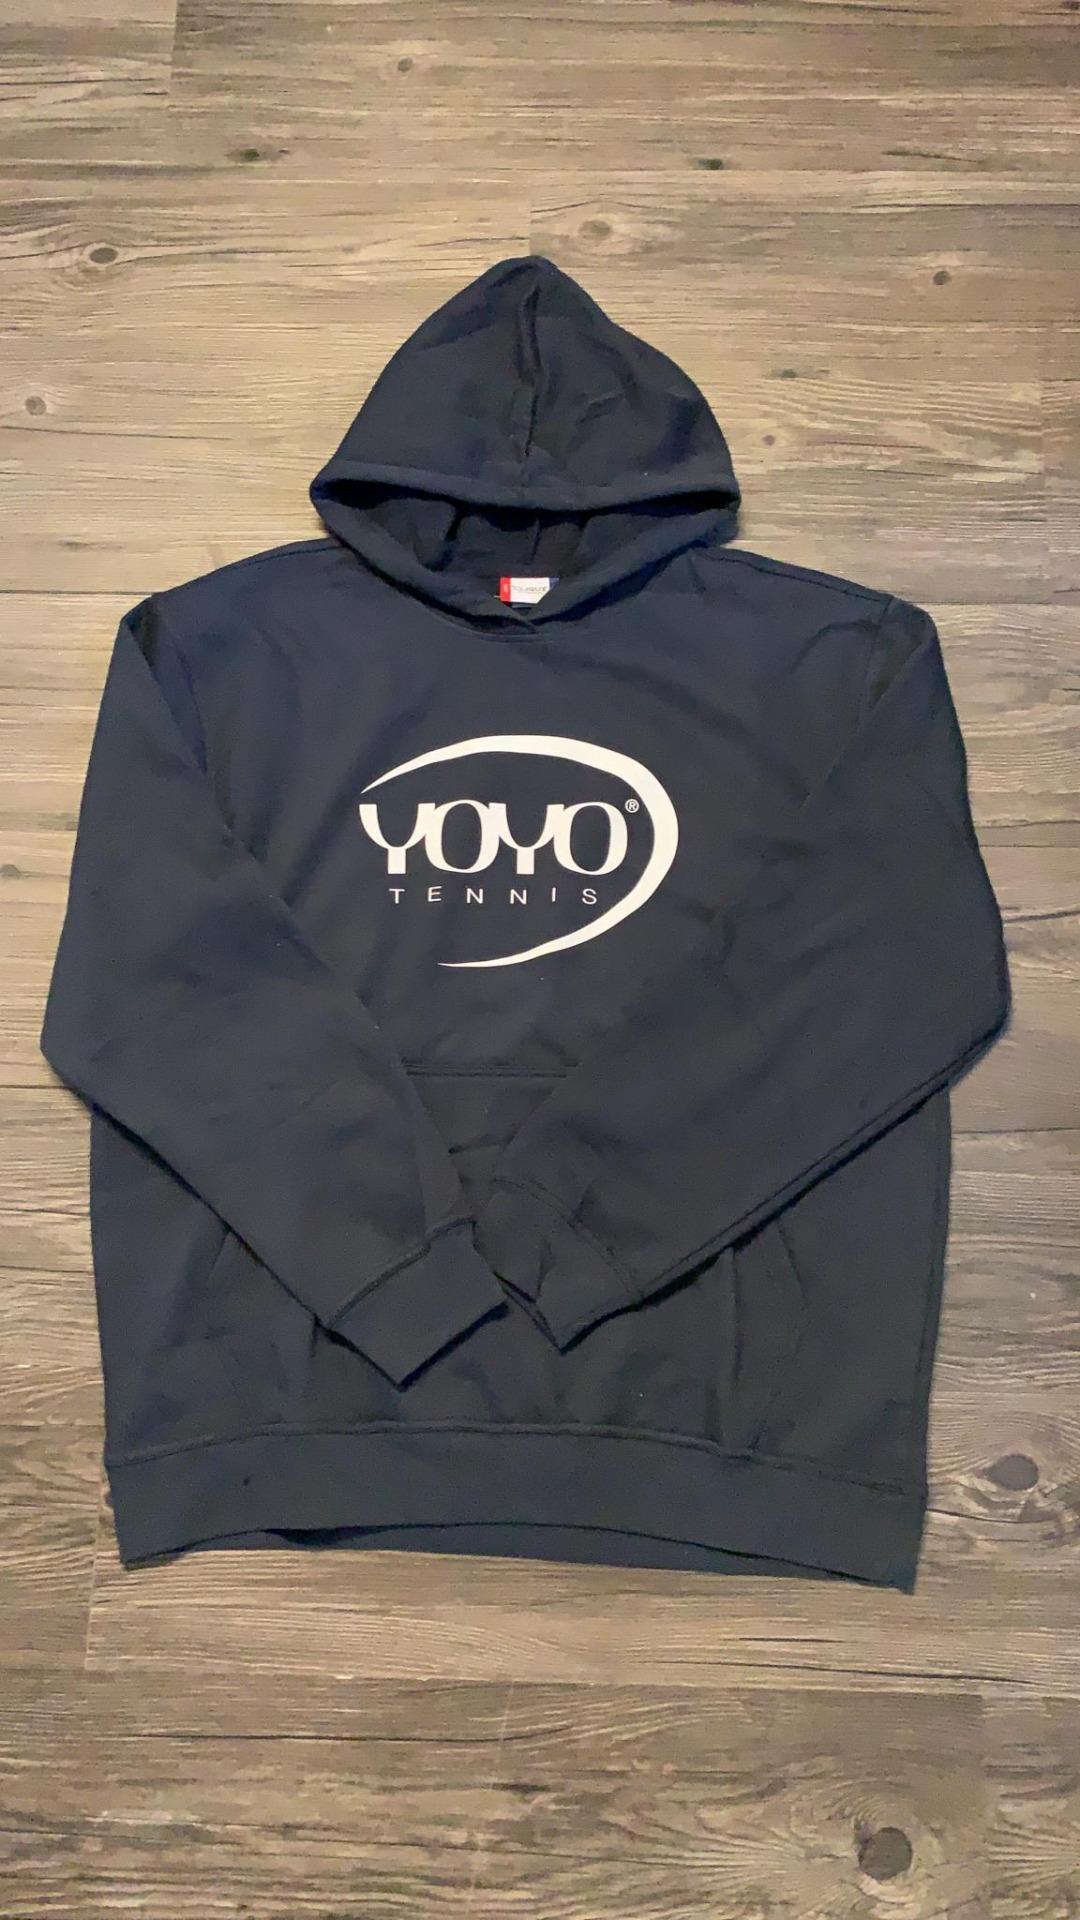 YOYO-TENNIS Hoody Navy con Logo Bianco